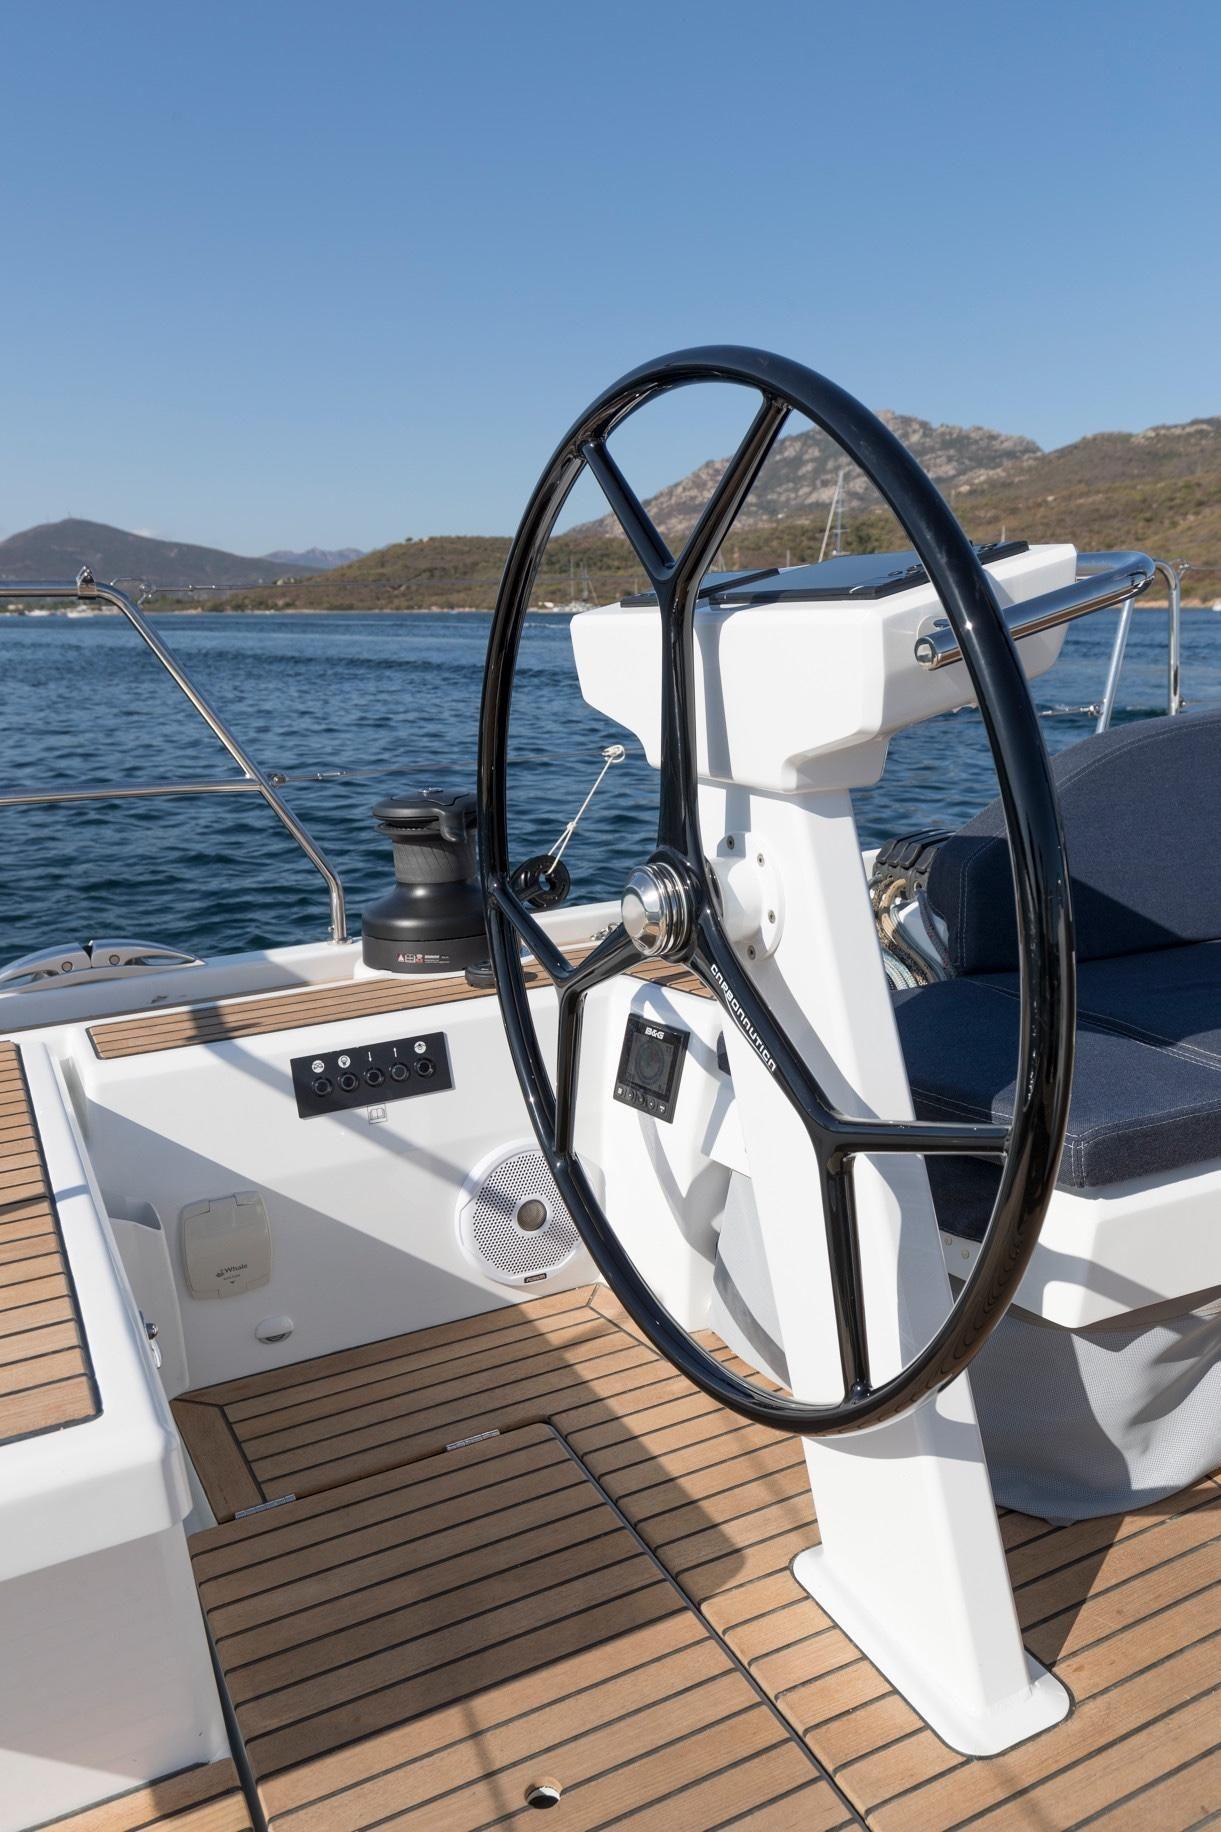 2019 New Beneteau Oceanis 51 1 Cruiser Sailboat For Sale